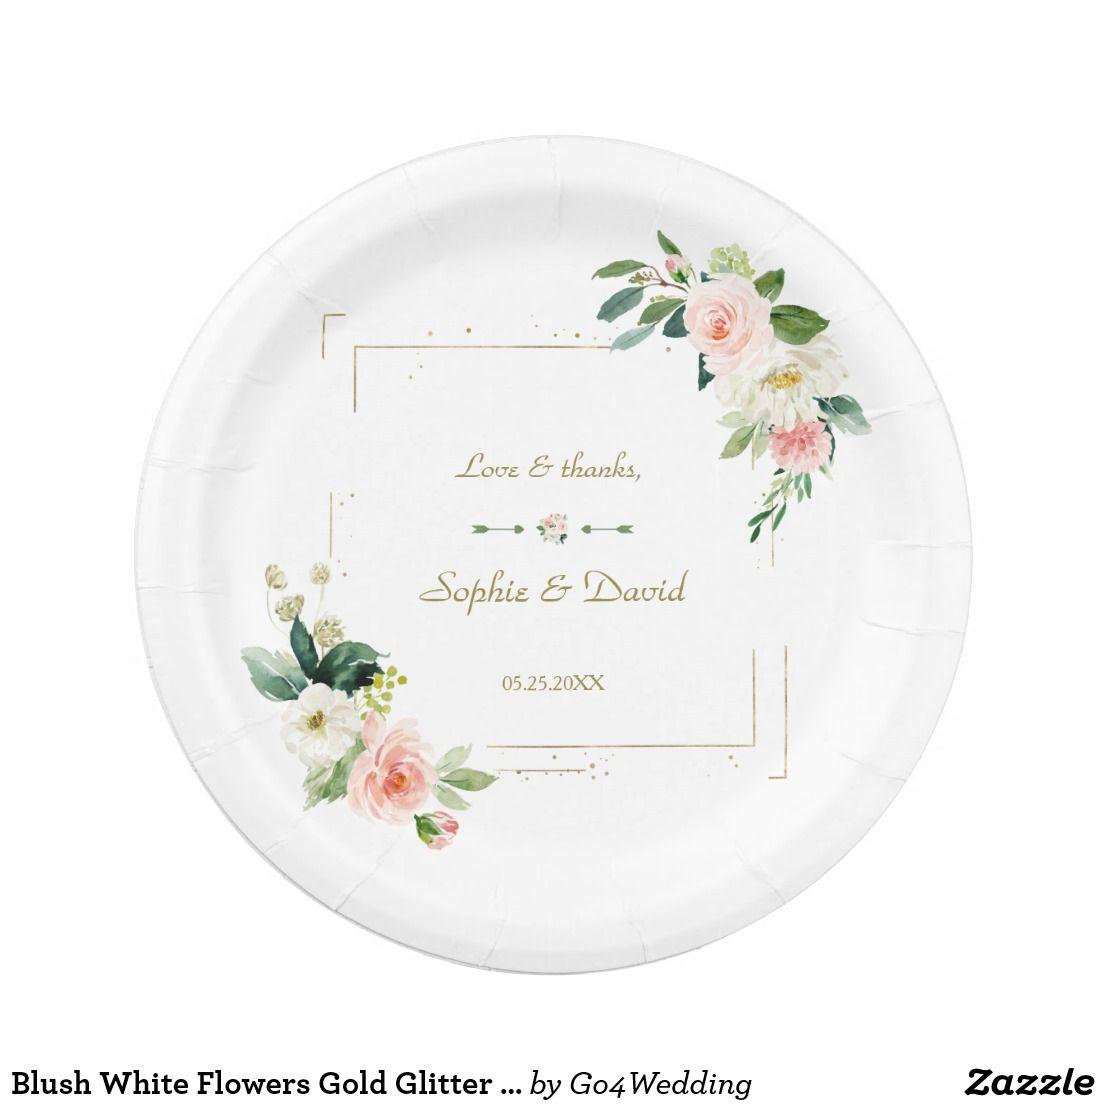 Blush White Flowers Gold Glitter Wedding Paper Plate Zazzle Com